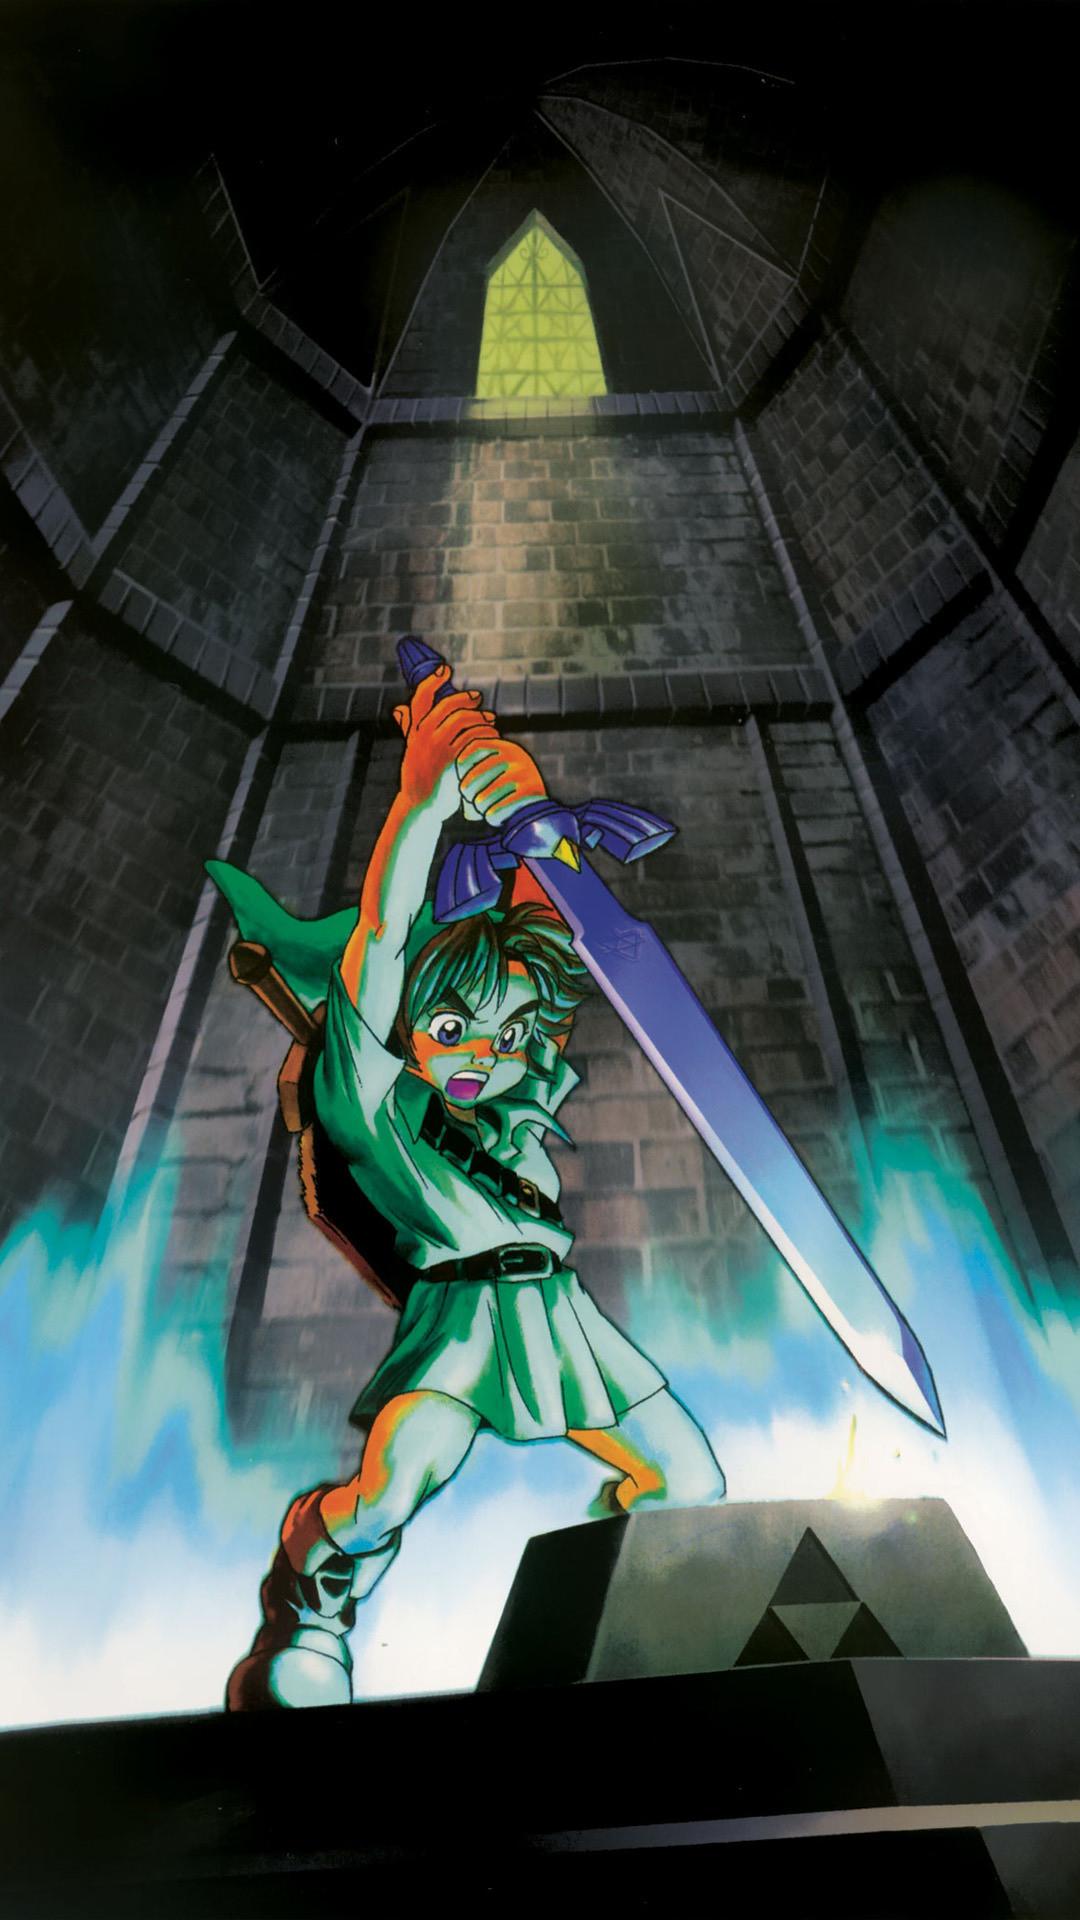 Download 3840x2160 The Legend Of Zelda Ocarina Of Time Wallpaper